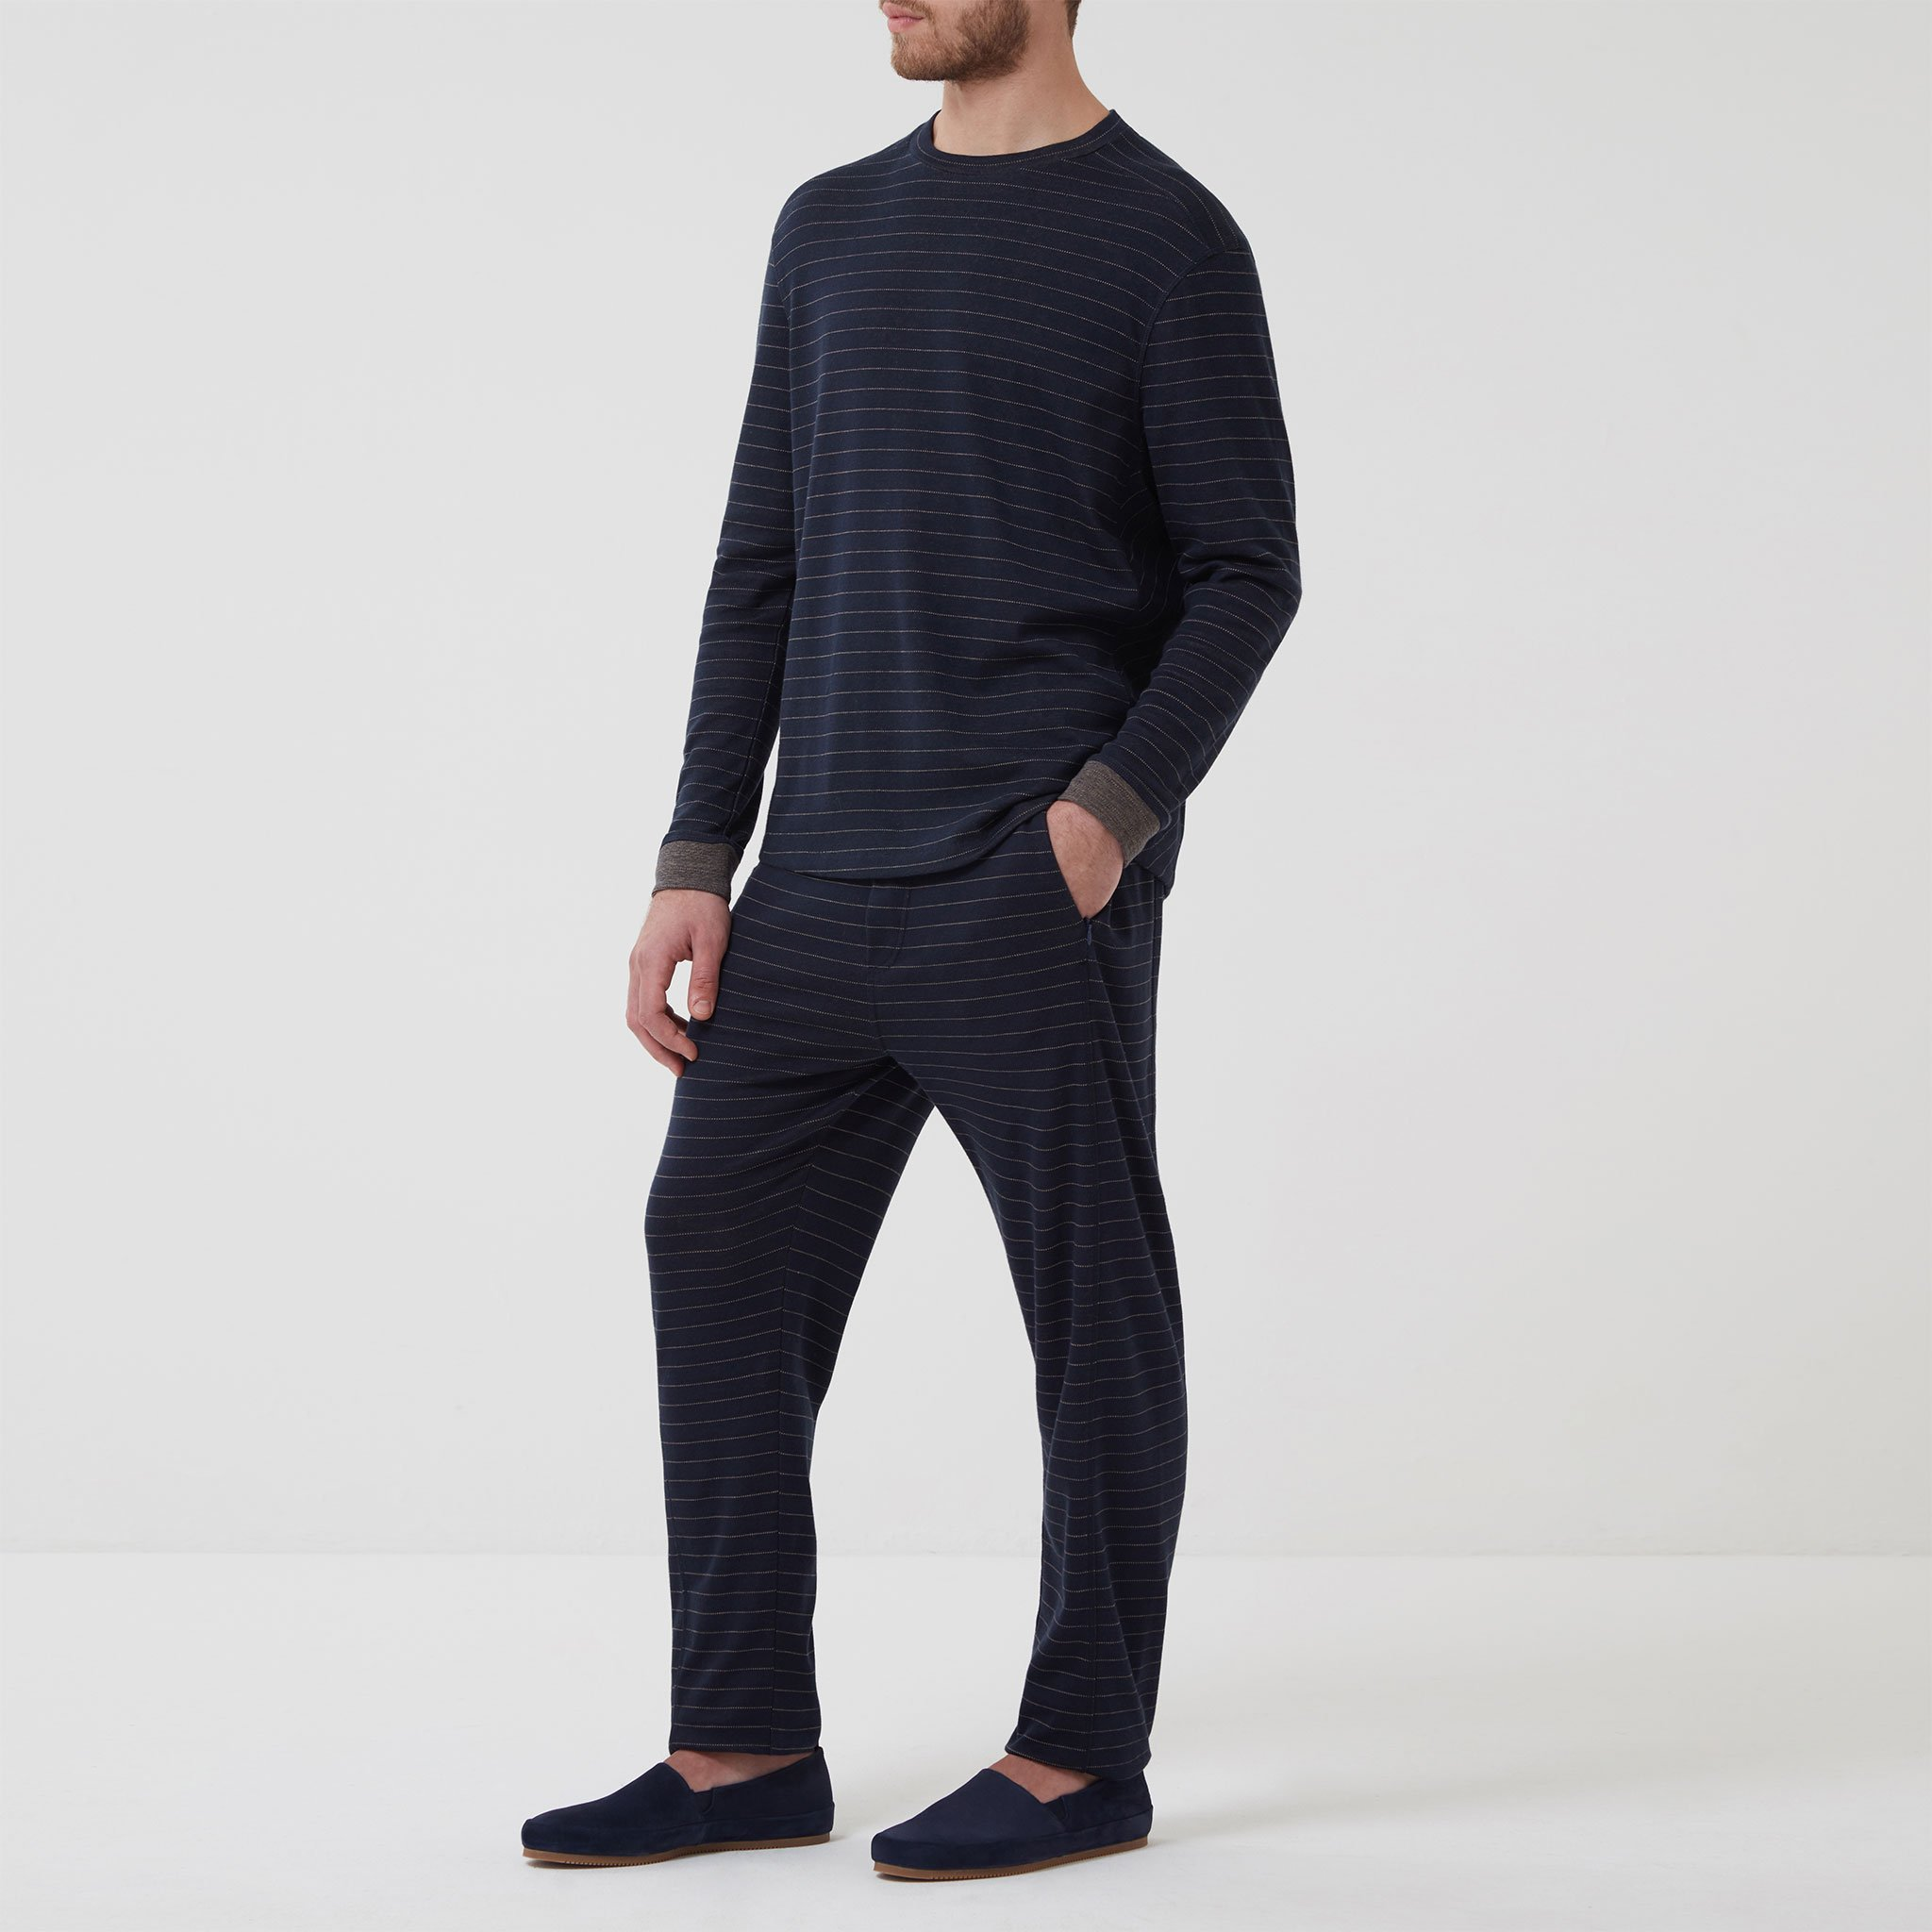 Cotton-Cashmere-Lounge-Jogger-Navy-Stripe_02.jpg